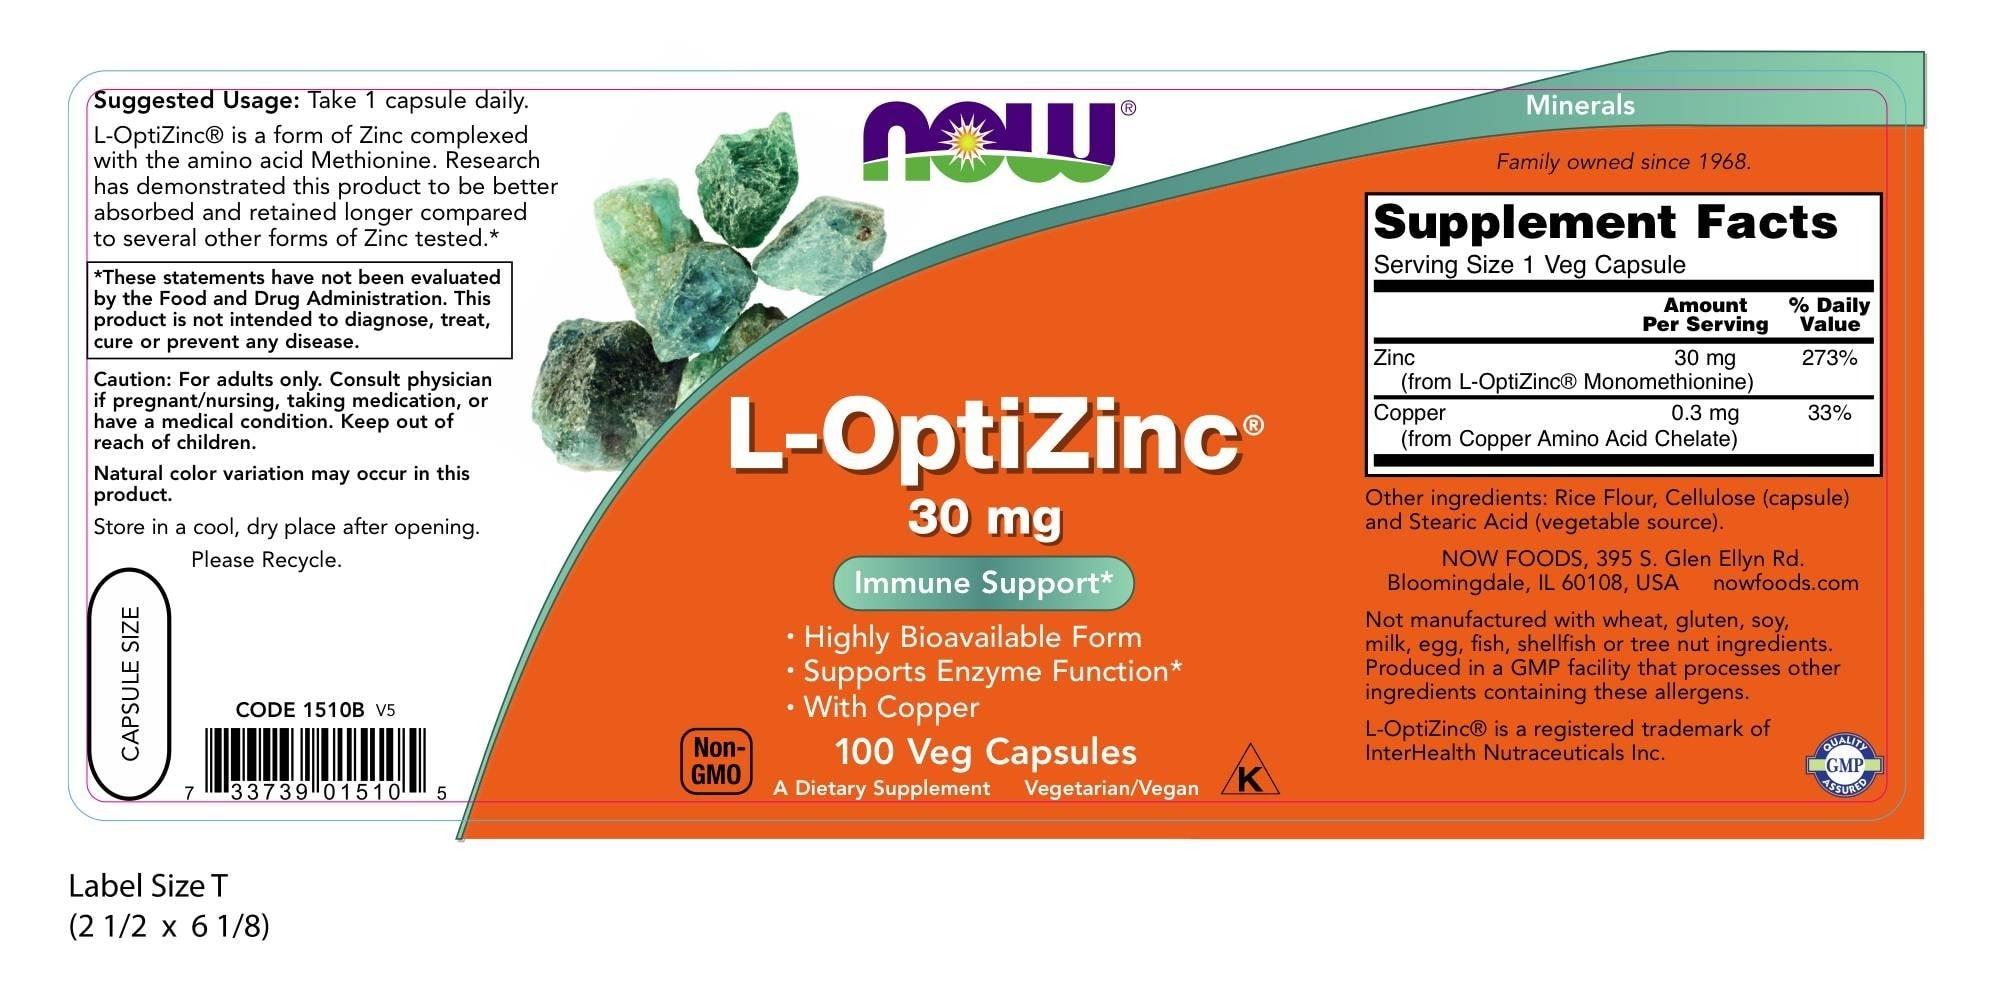 NOW - L-OptiZinc 30 mg (100 viên) - e848fc4e 6d8f 42b5 83f7 ee8a976e